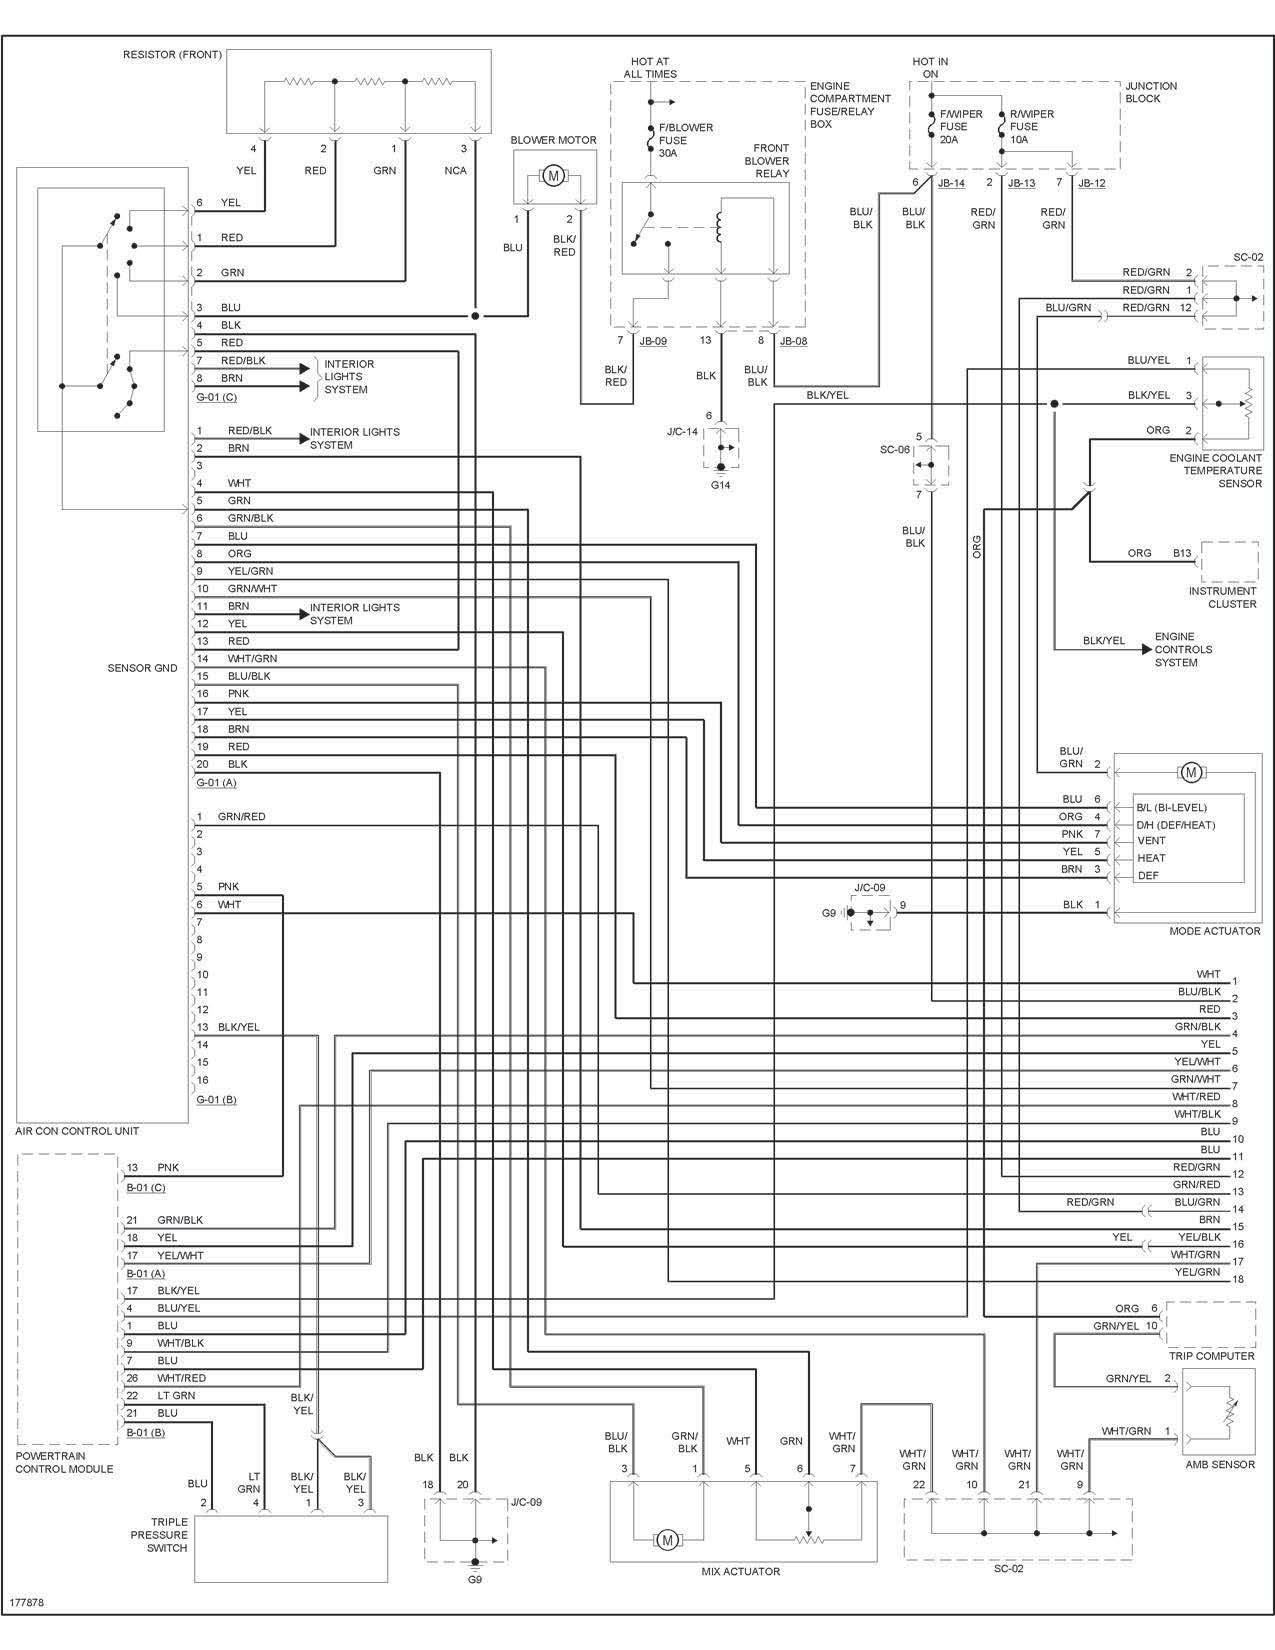 2006 kia amanti wiring diagram - data wiring diagram editor-agree -  editor-agree.vivarelliauto.it  vivarelliauto.it